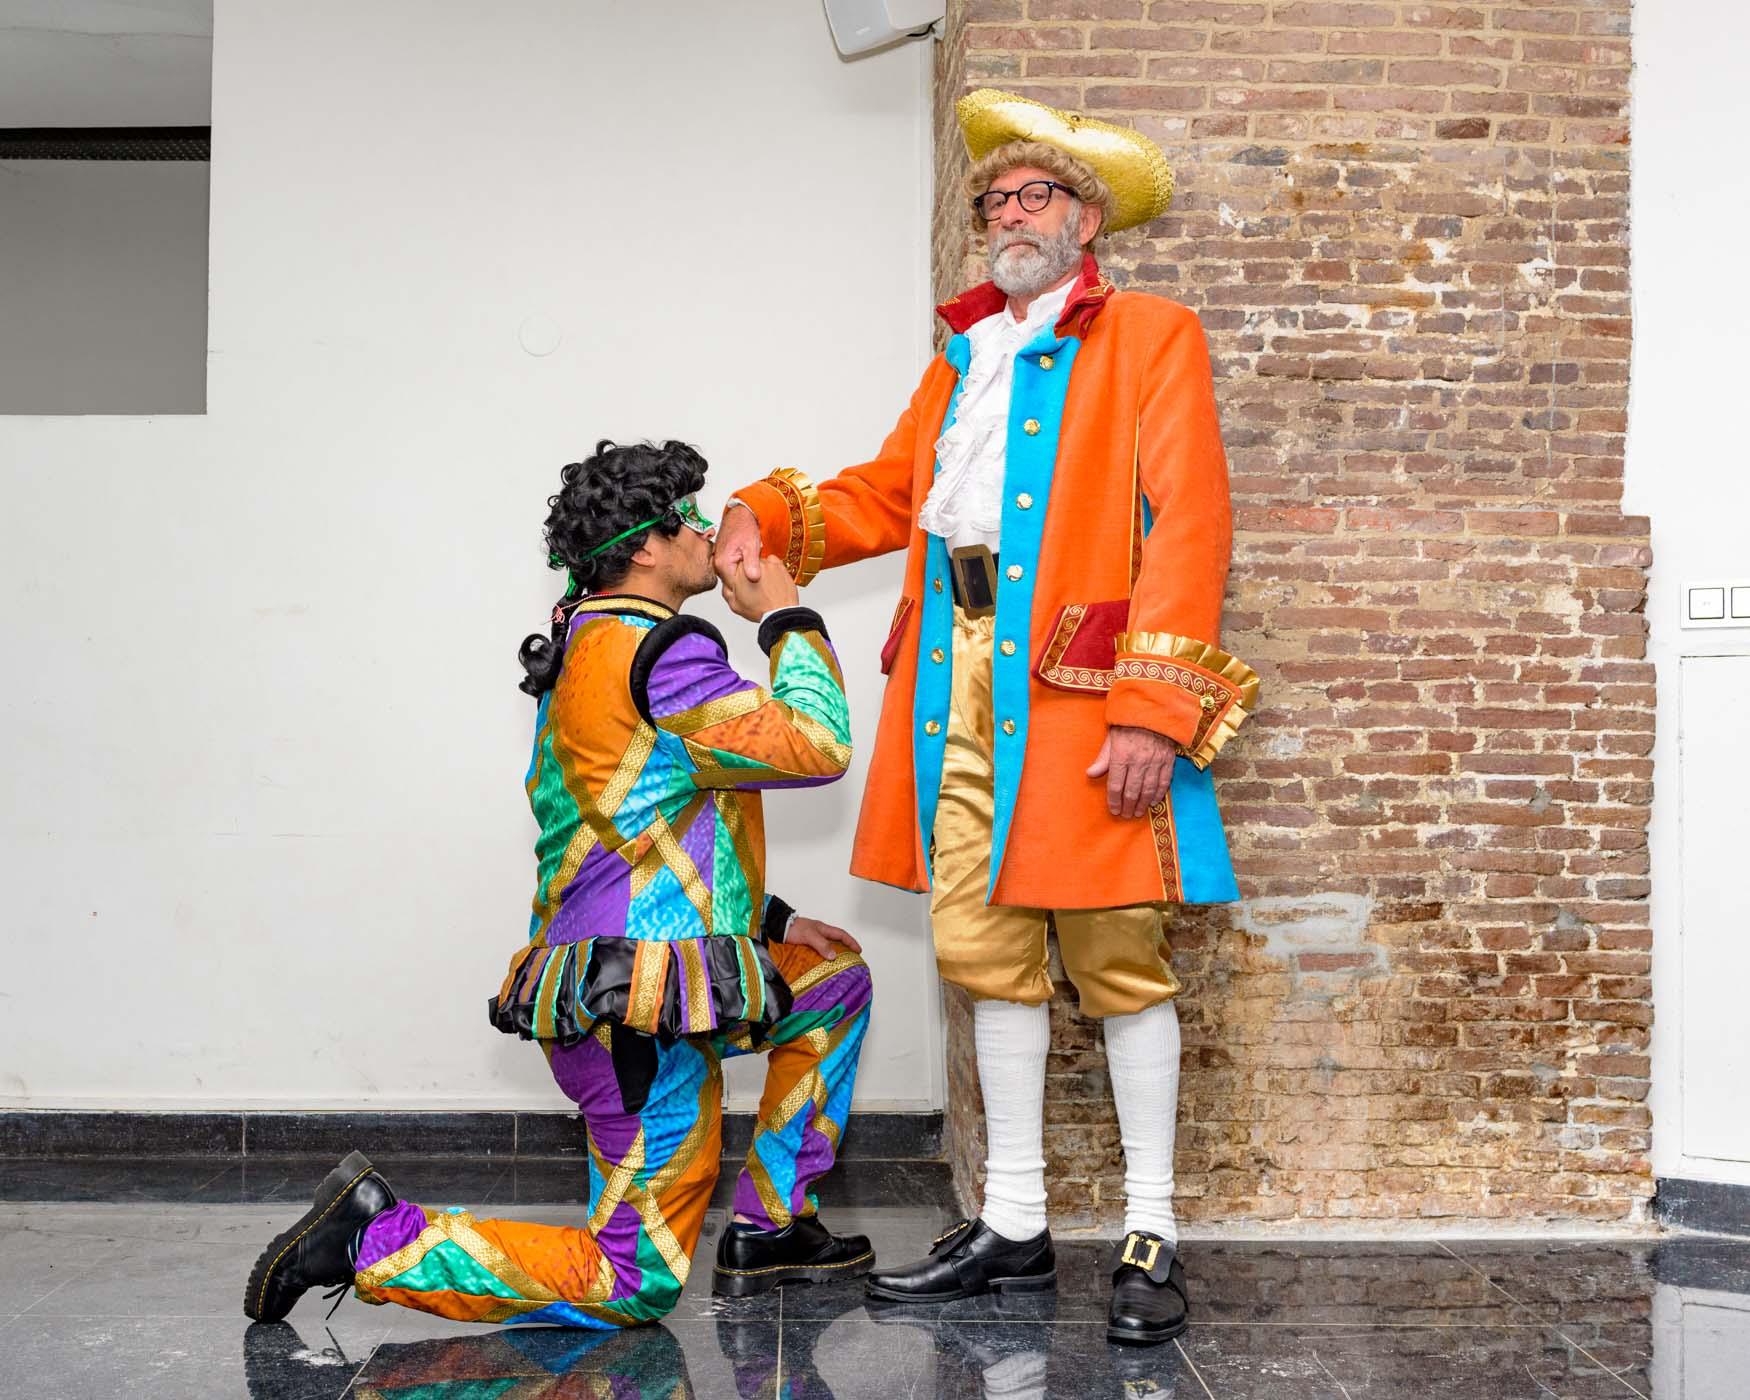 H05 - Colour Guys - Hartjesdag 2019 Zeedijk Amsterdam | © Sas Schilten Fotografie